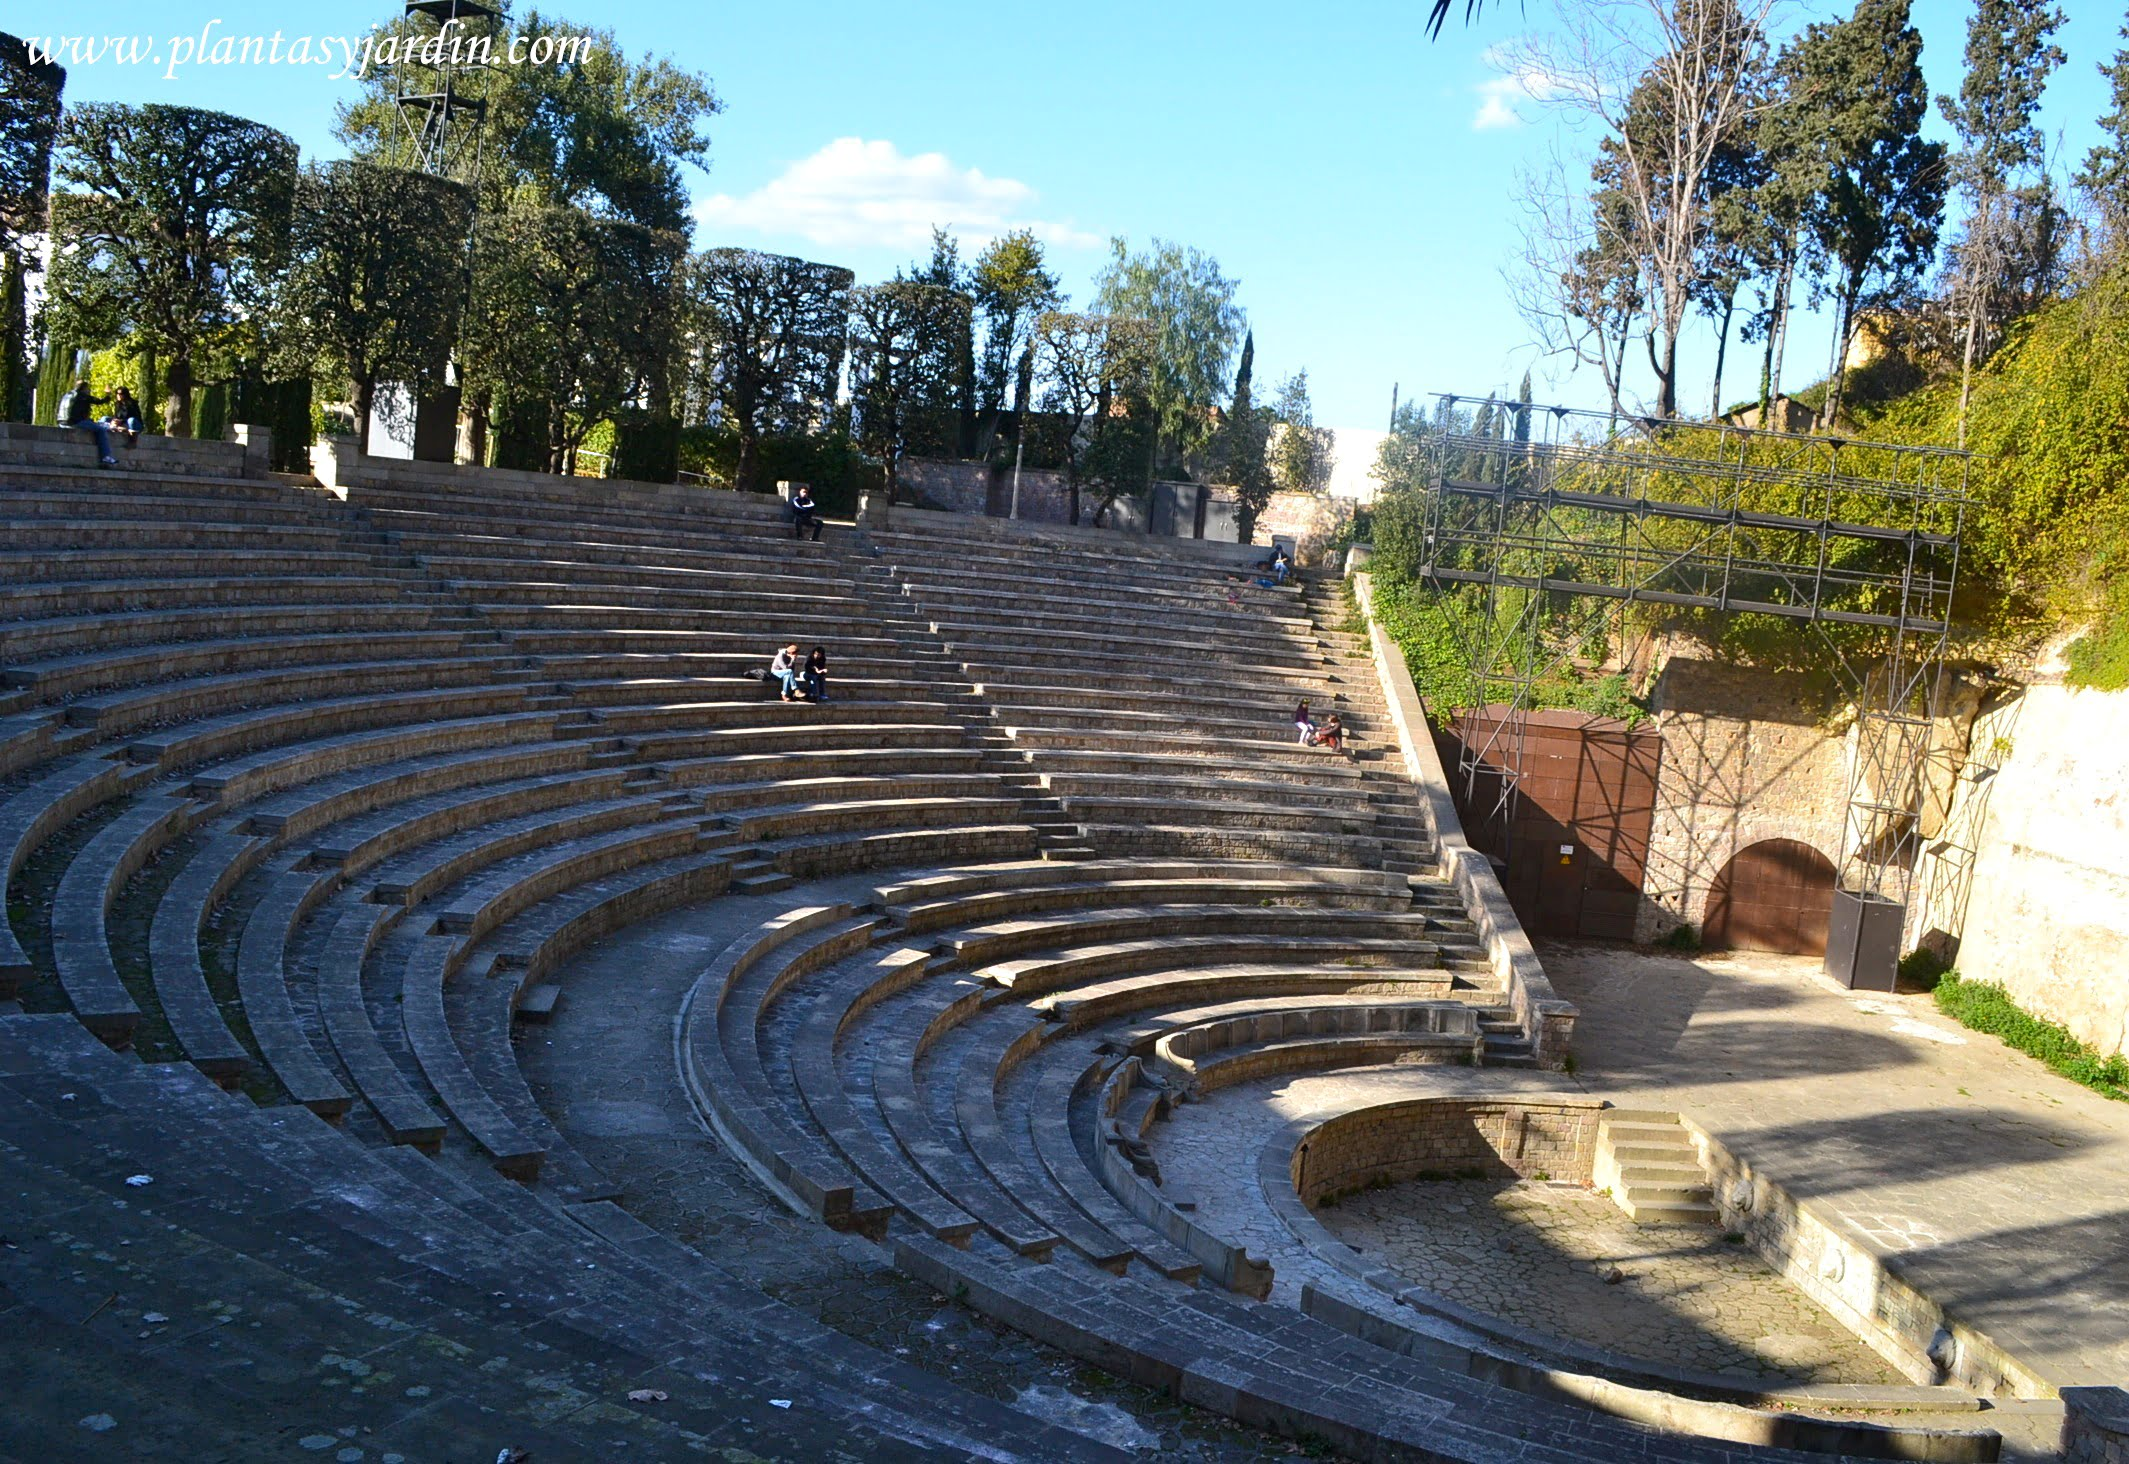 el anfiteatro del Jardin del Teatre Grec construido sobre una antigua pedrera